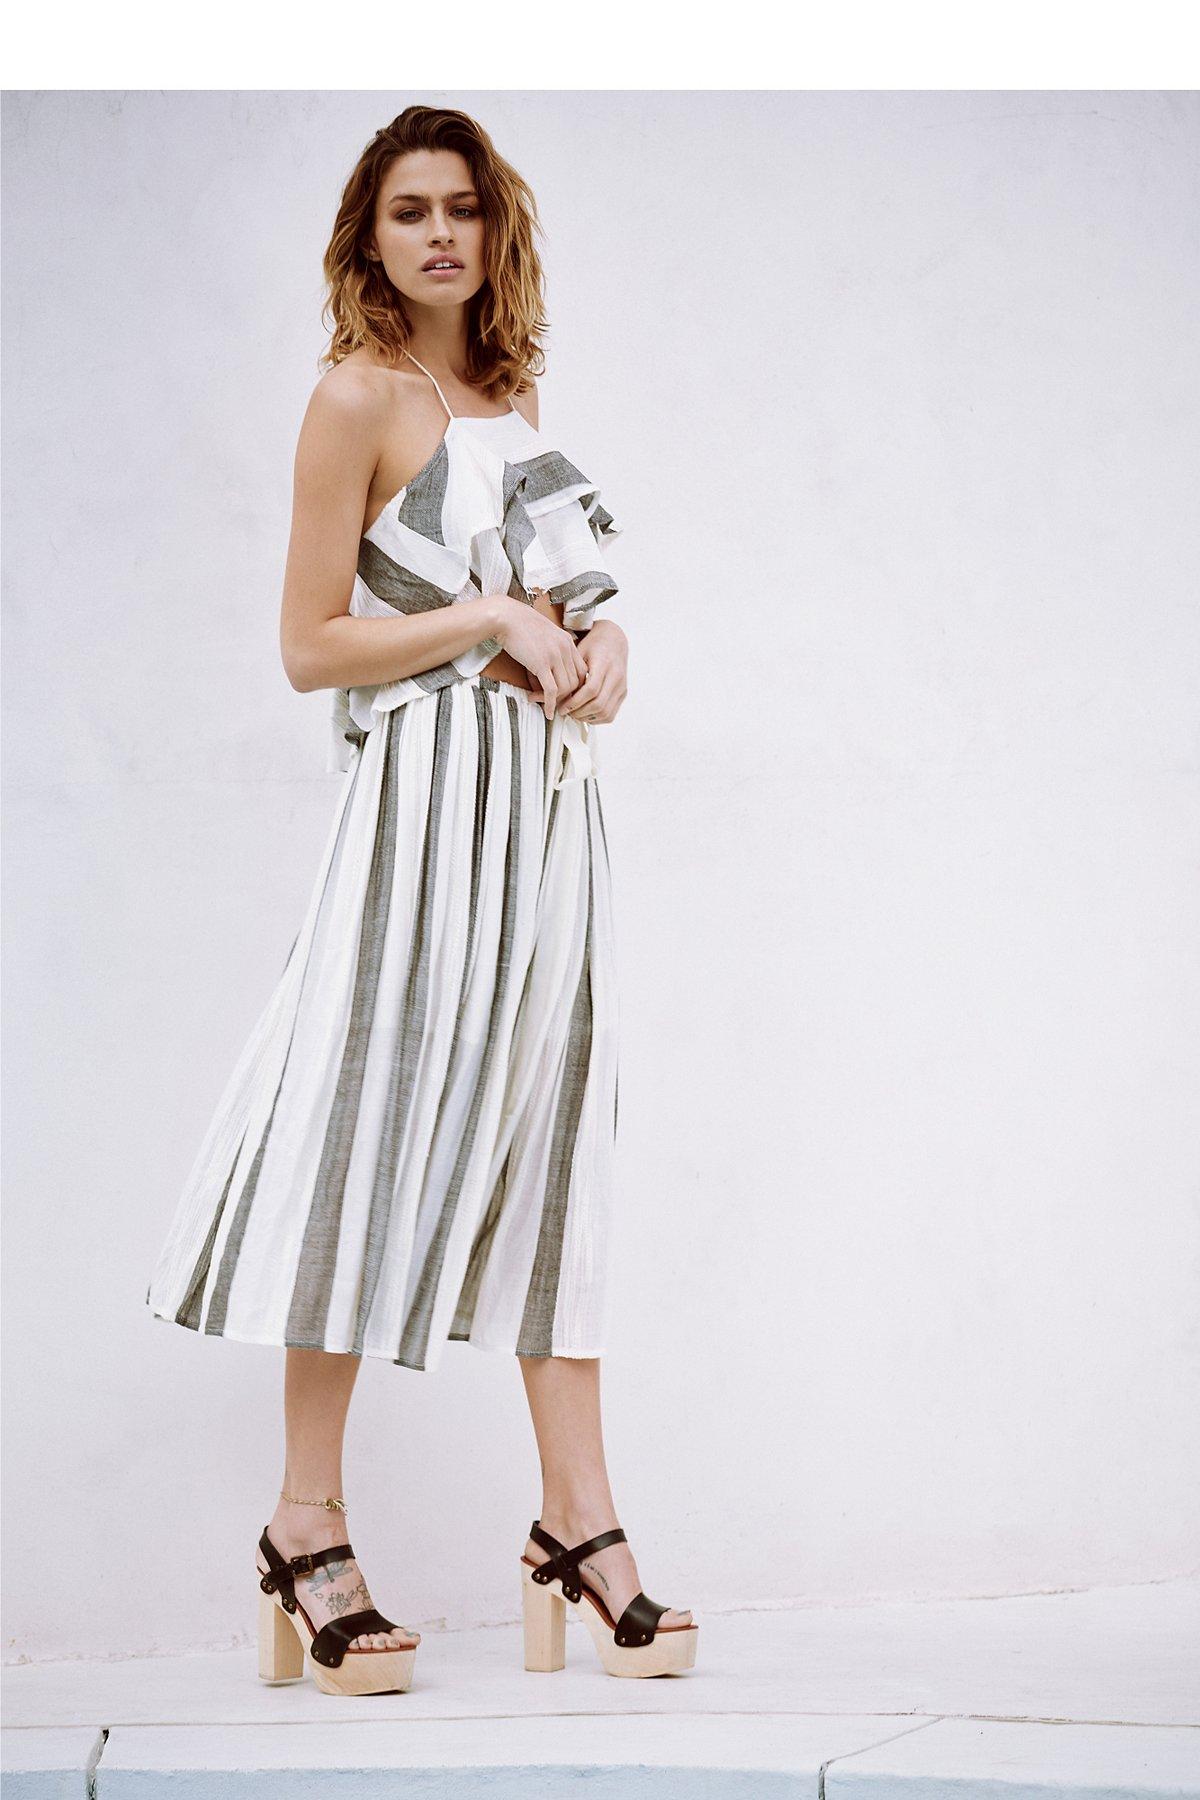 Lily条纹套装